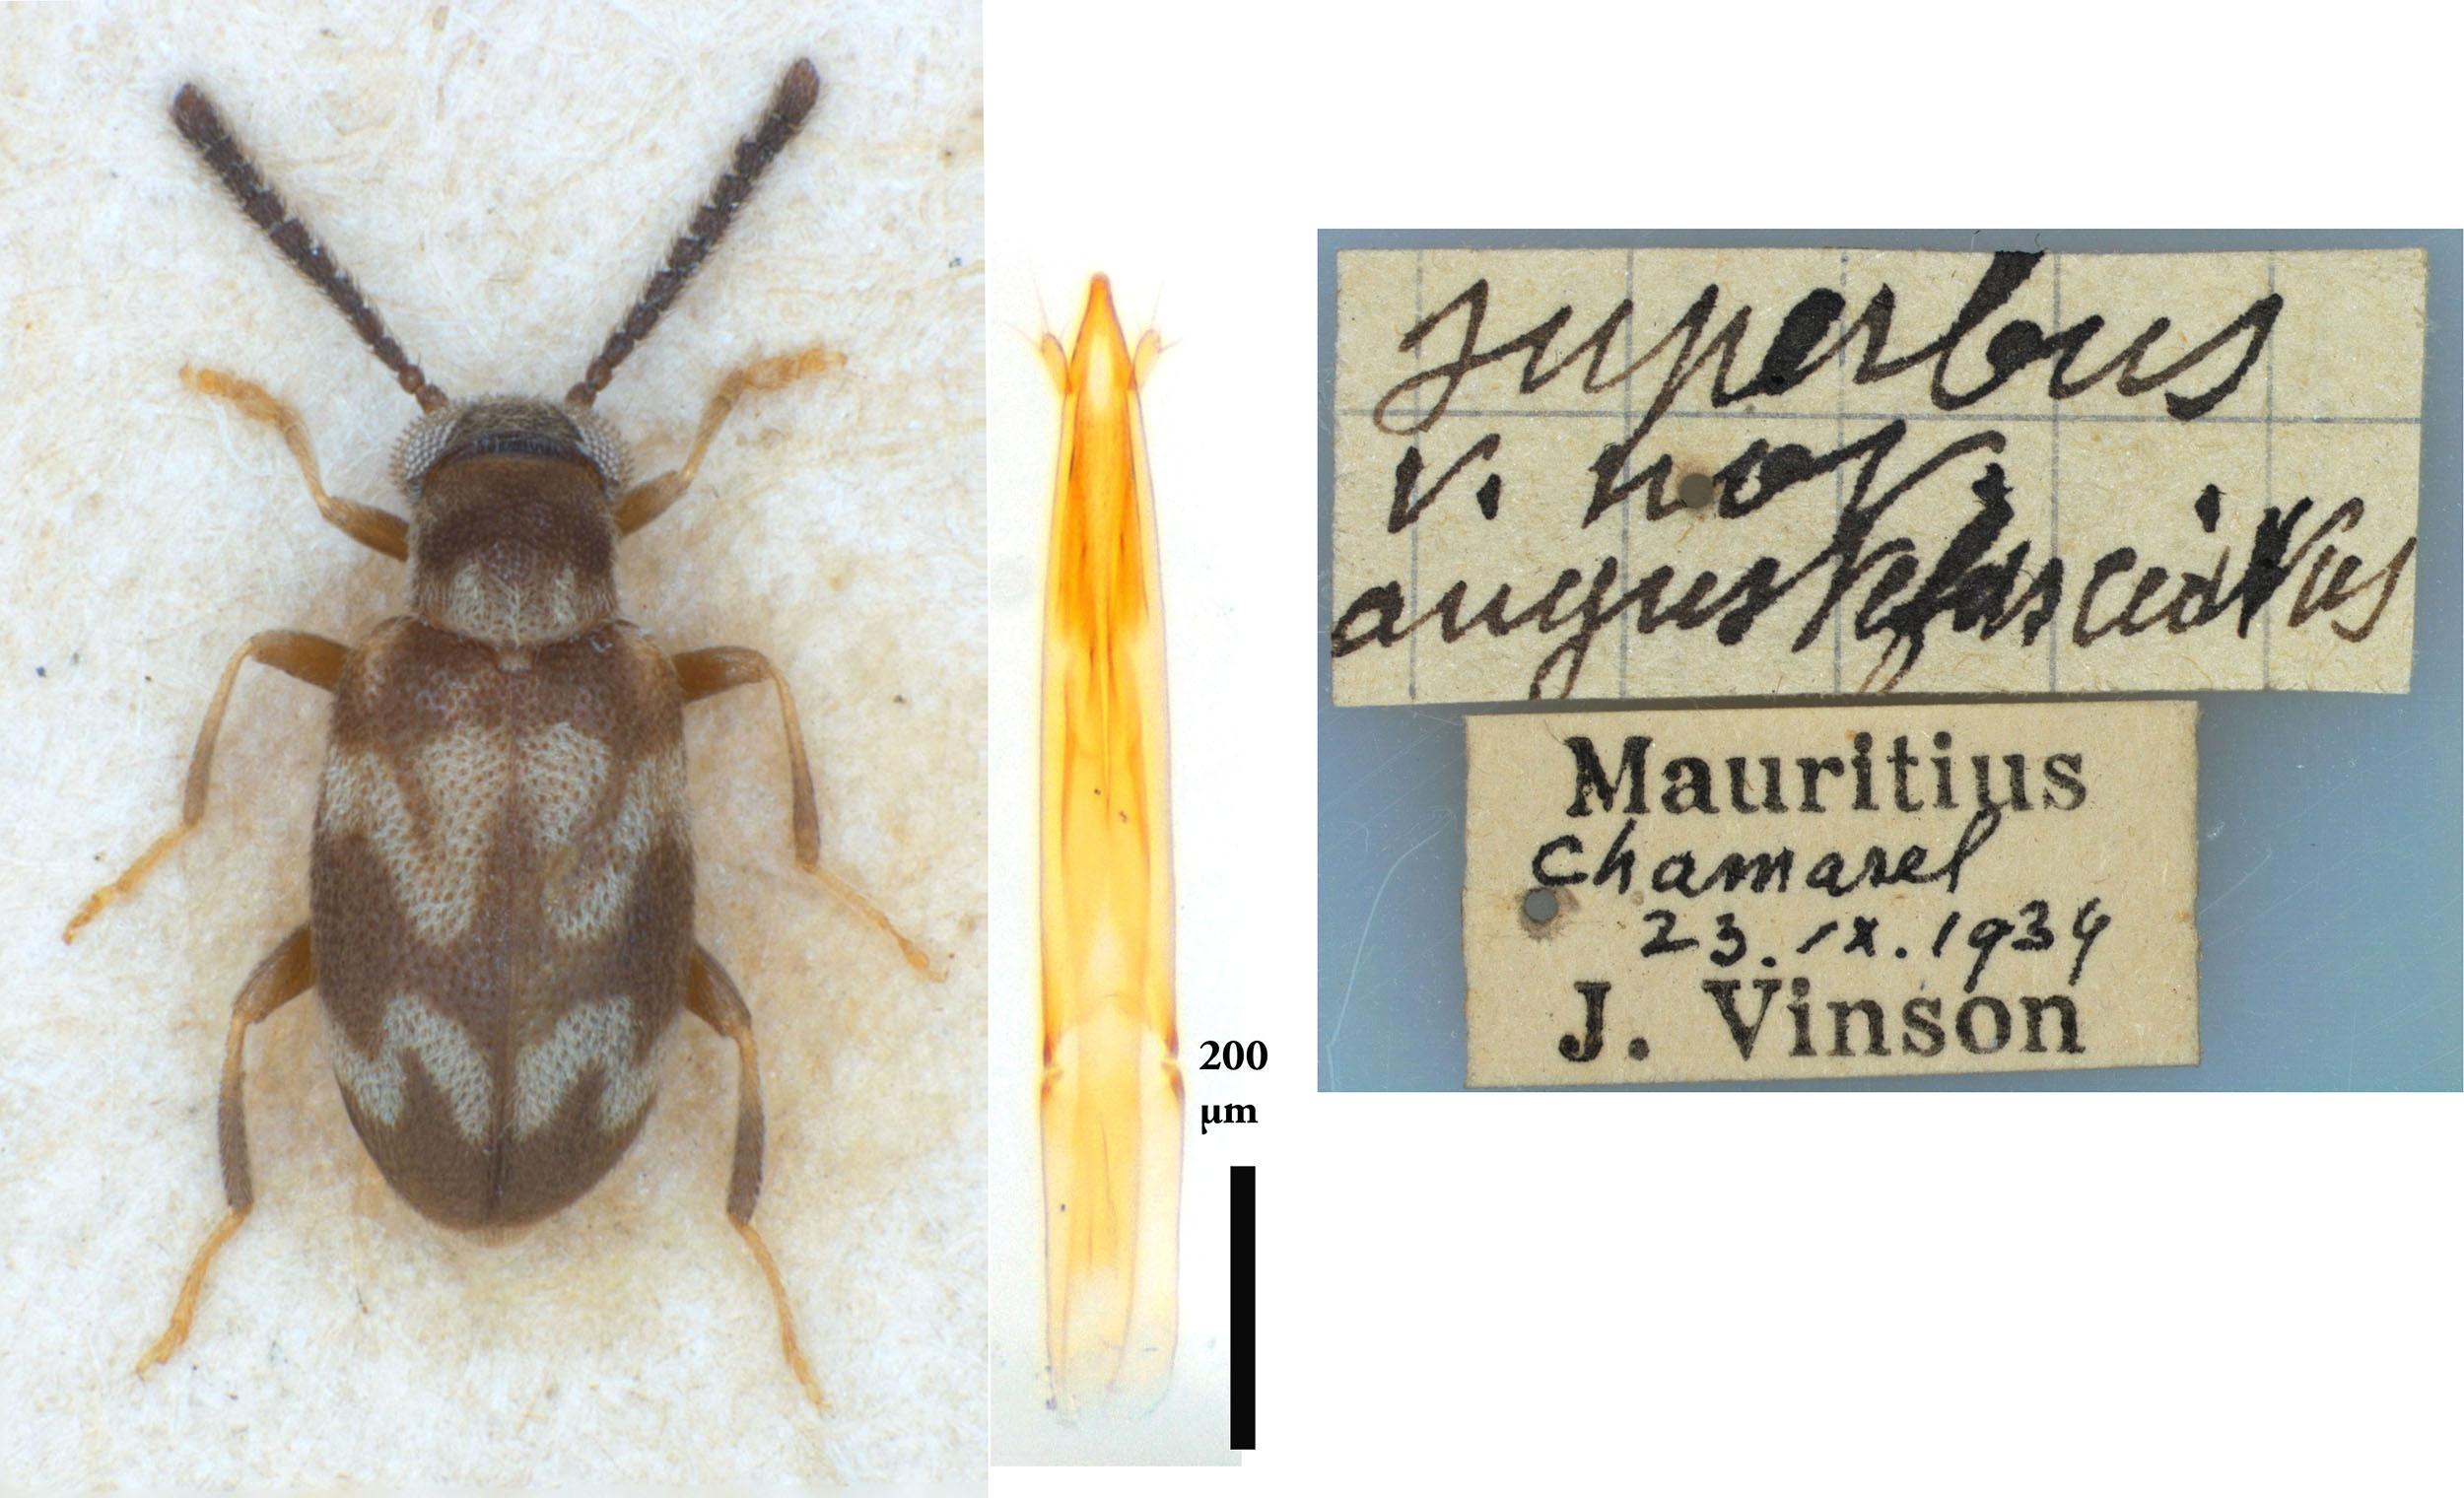 NG1403 Mixaderus angustifasciatus type